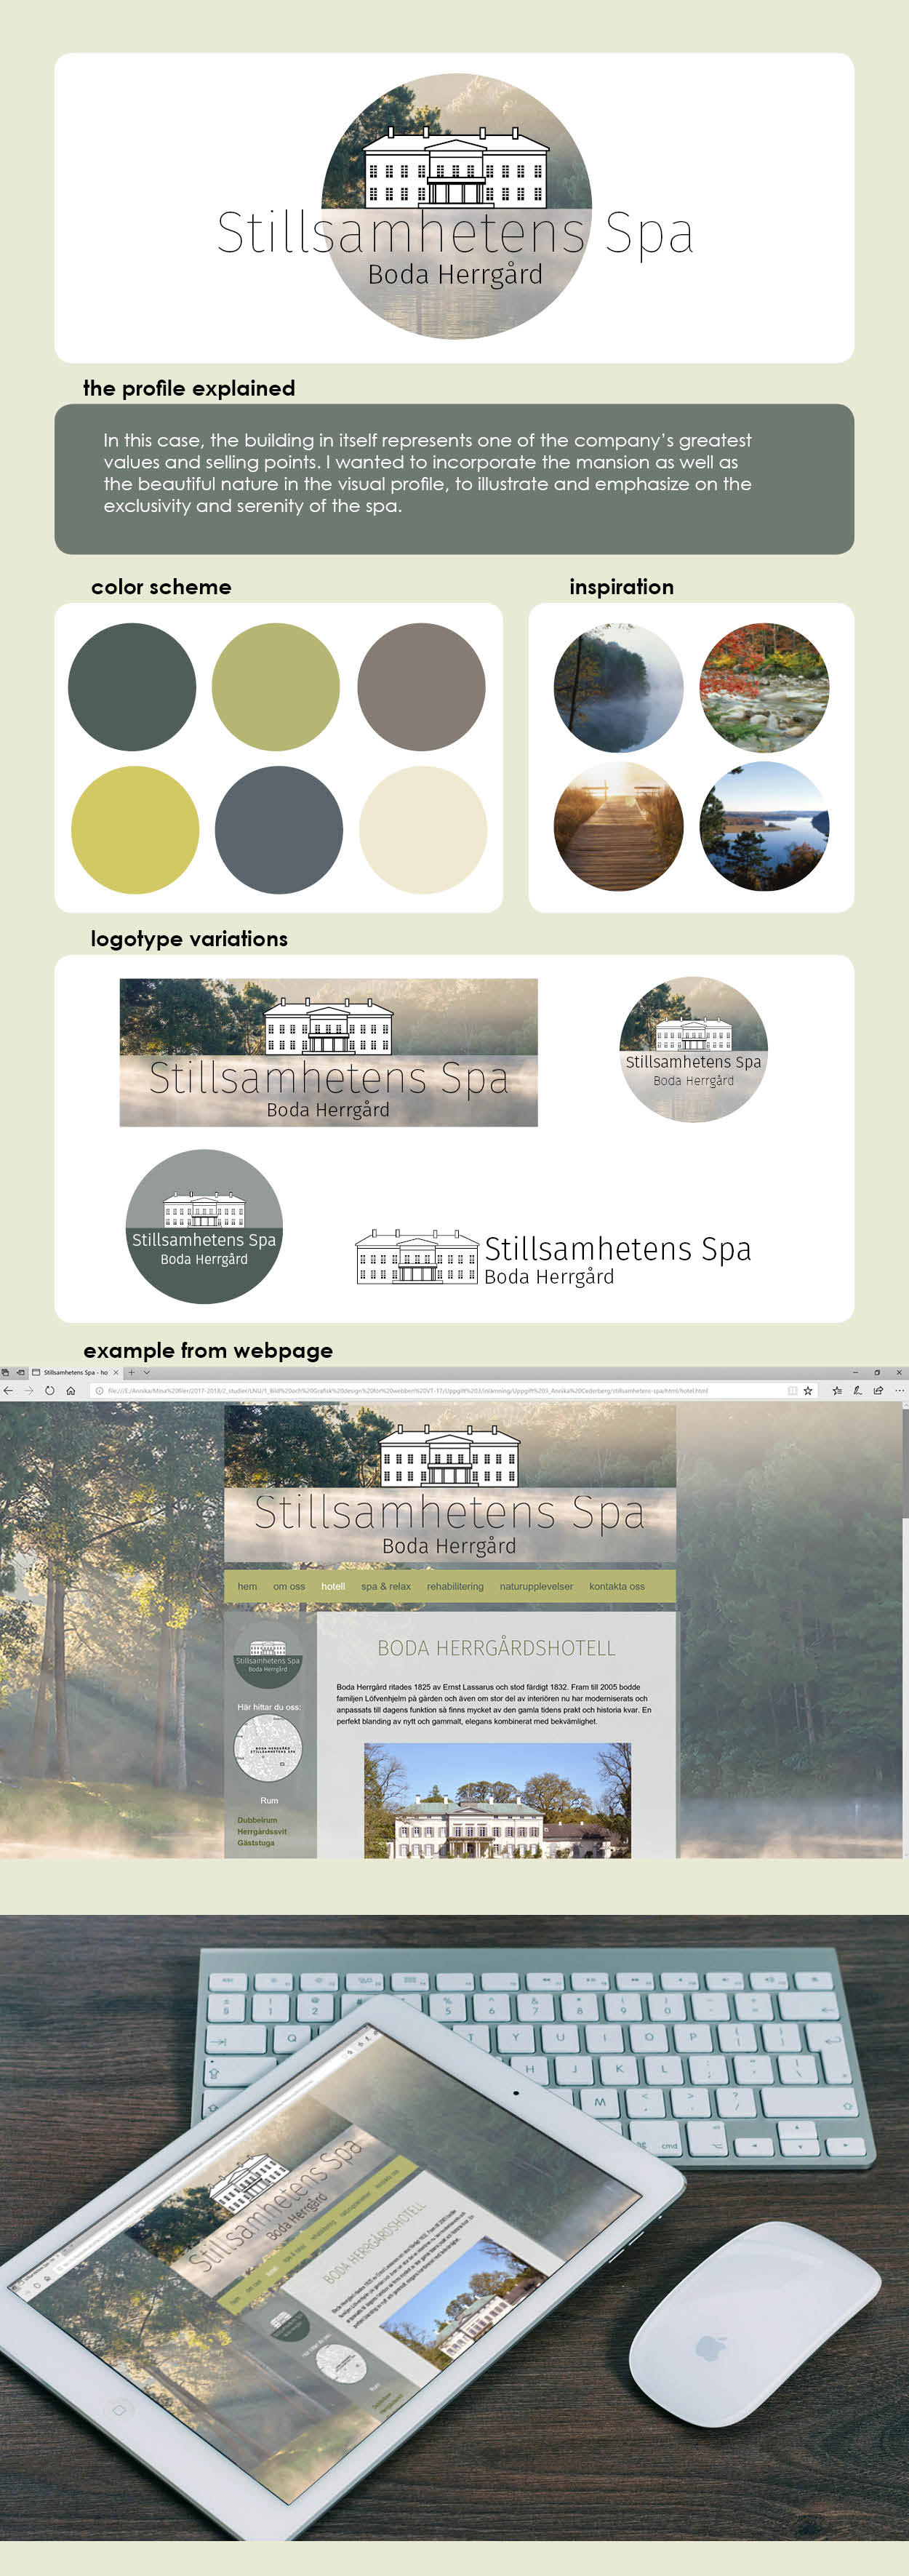 branding-samlade presentationer2.jpg